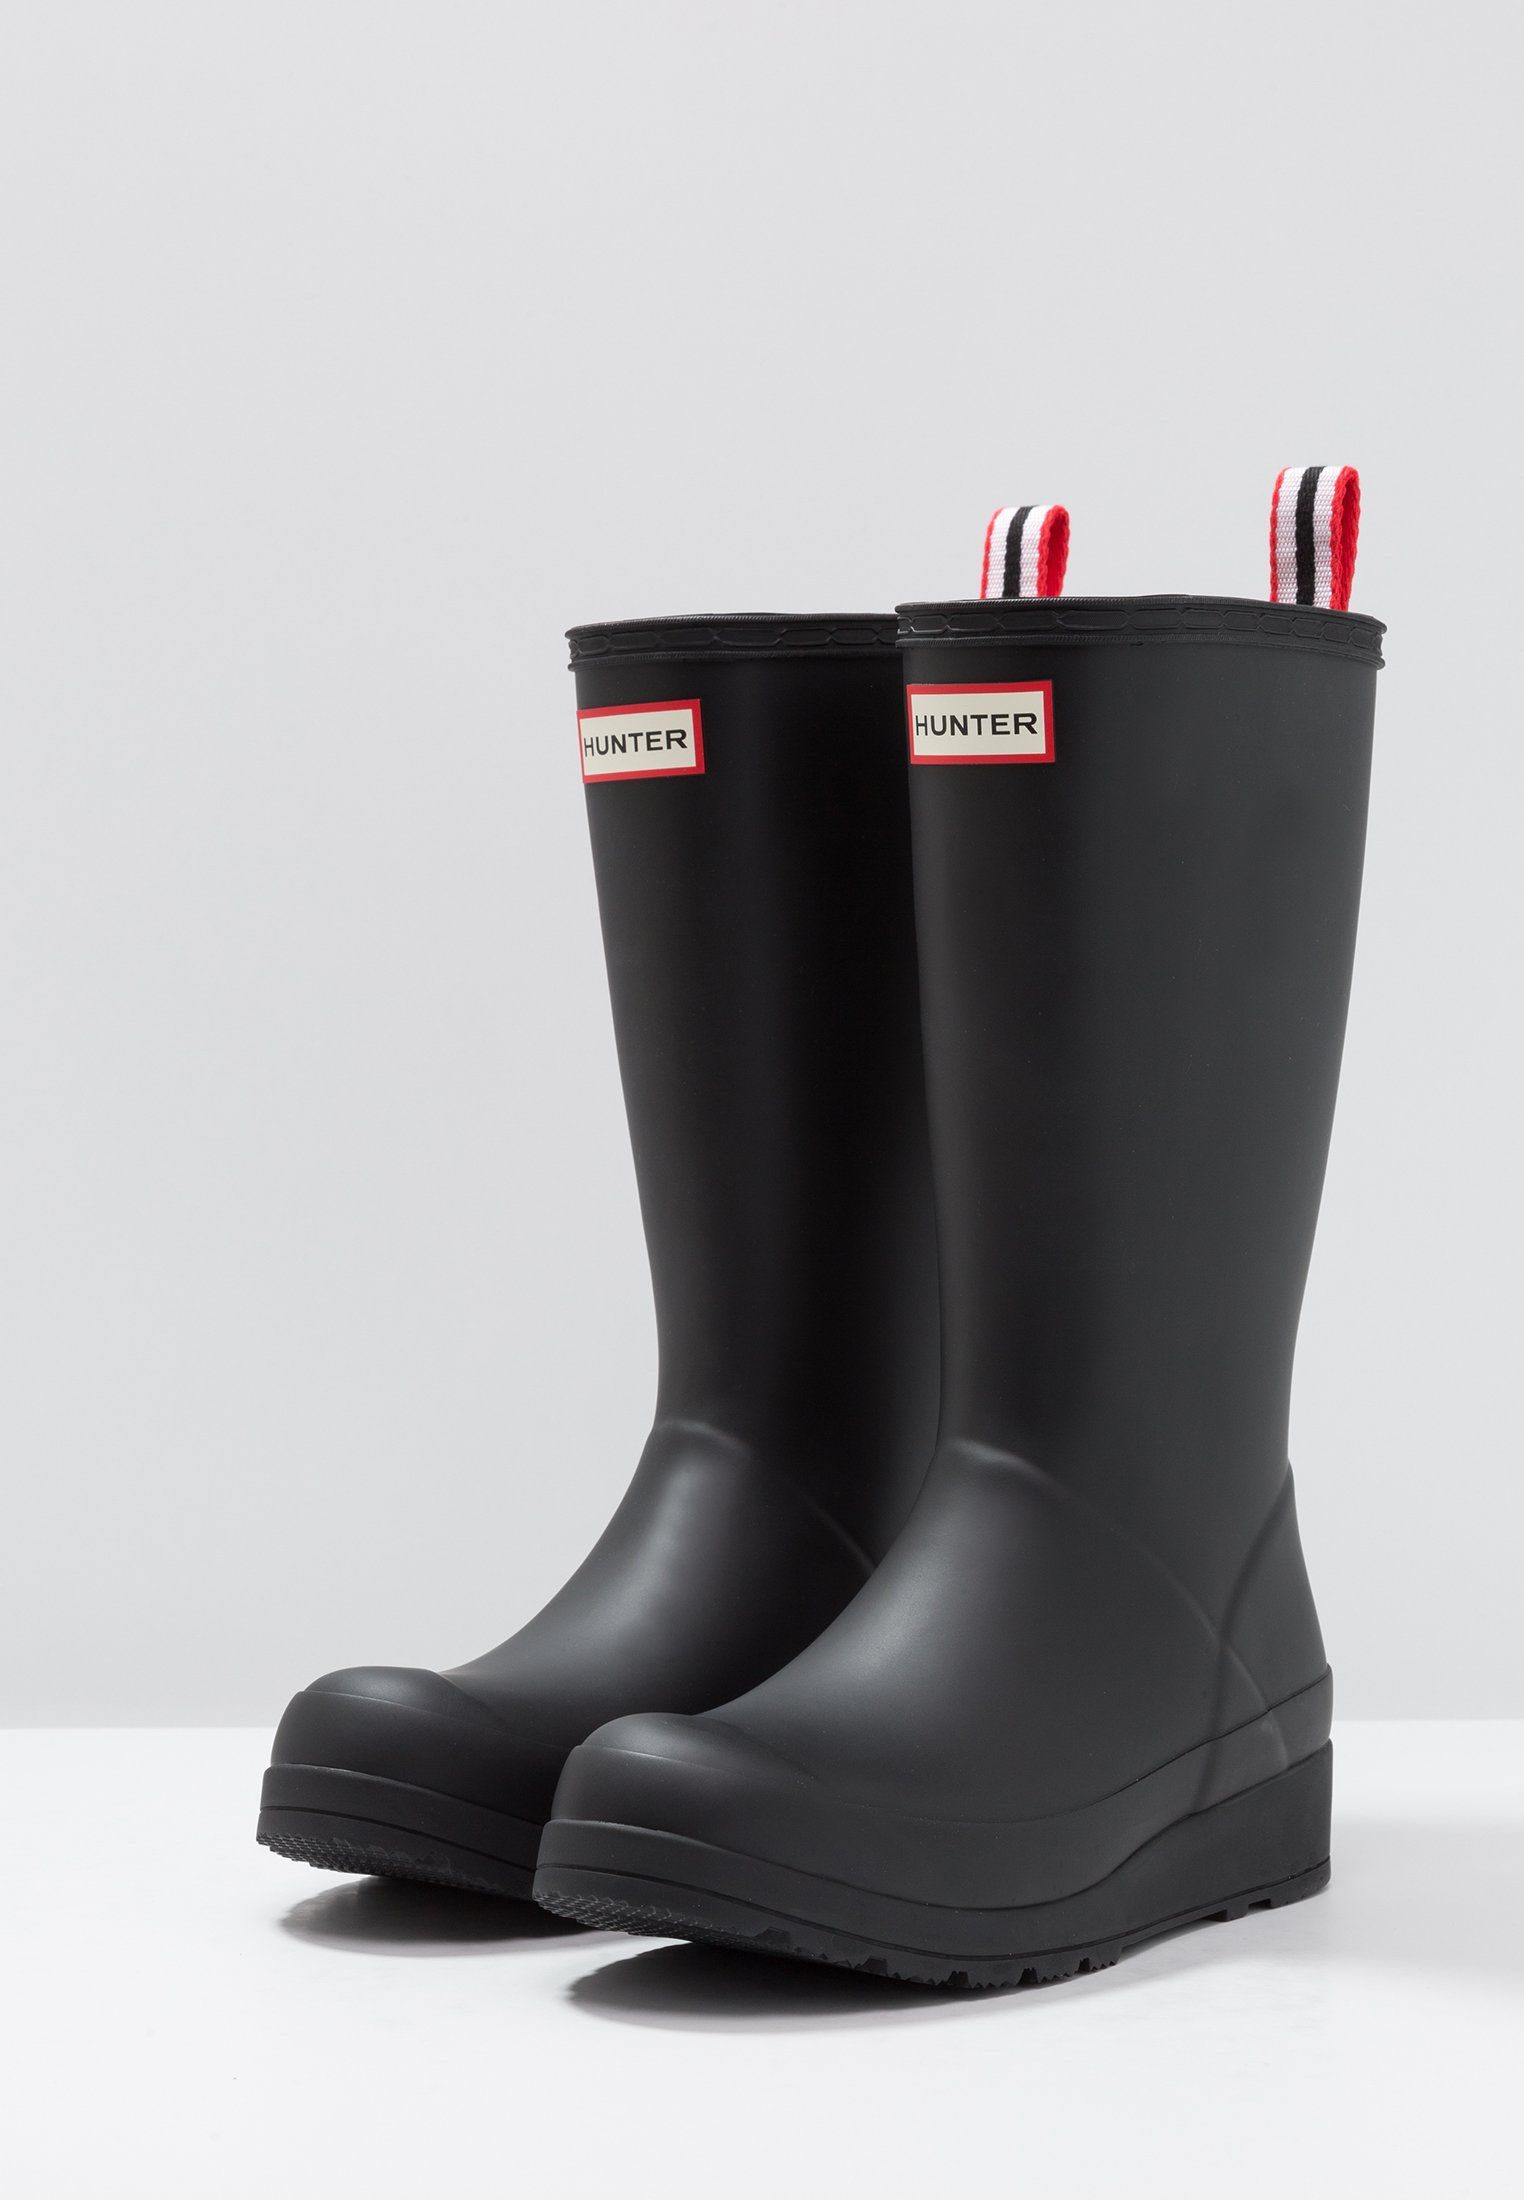 Hunter ORIGINAL ORIGINALPLAY BOOT TALL - Bottes en caoutchouc - black - Bottes femme Designer